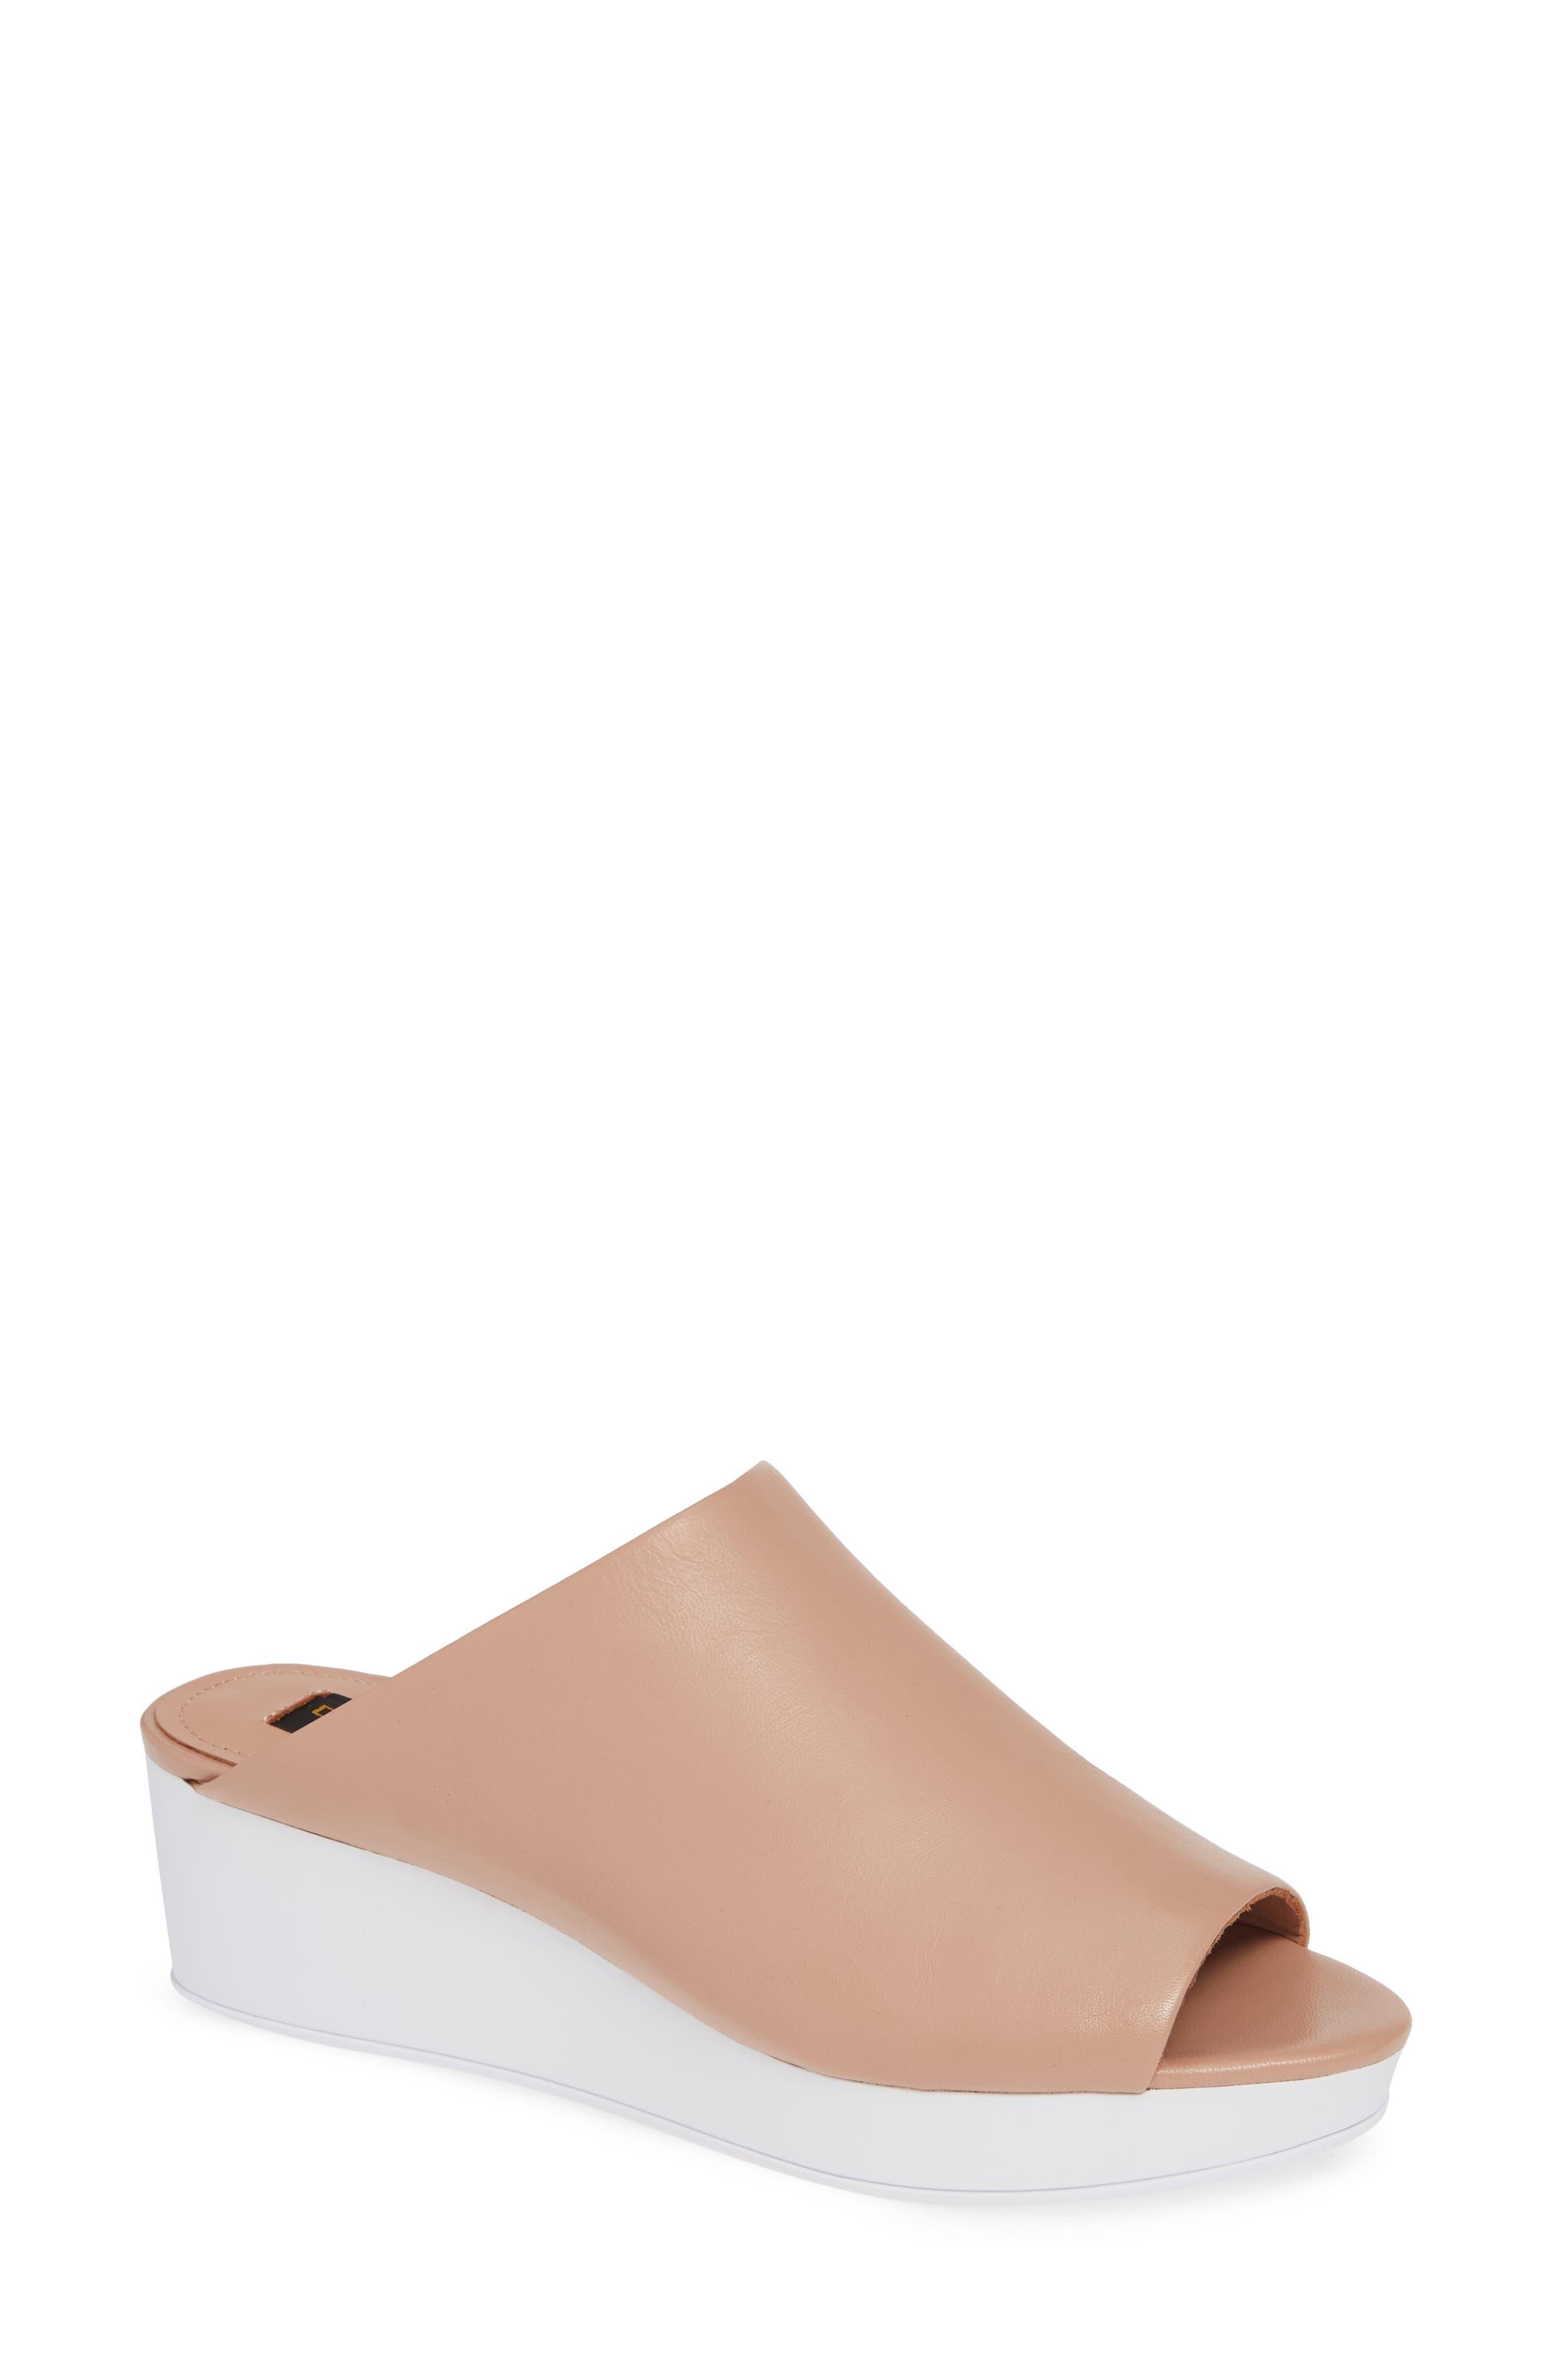 Donna Karan Reisley Wedge Slide Sandal- Pink